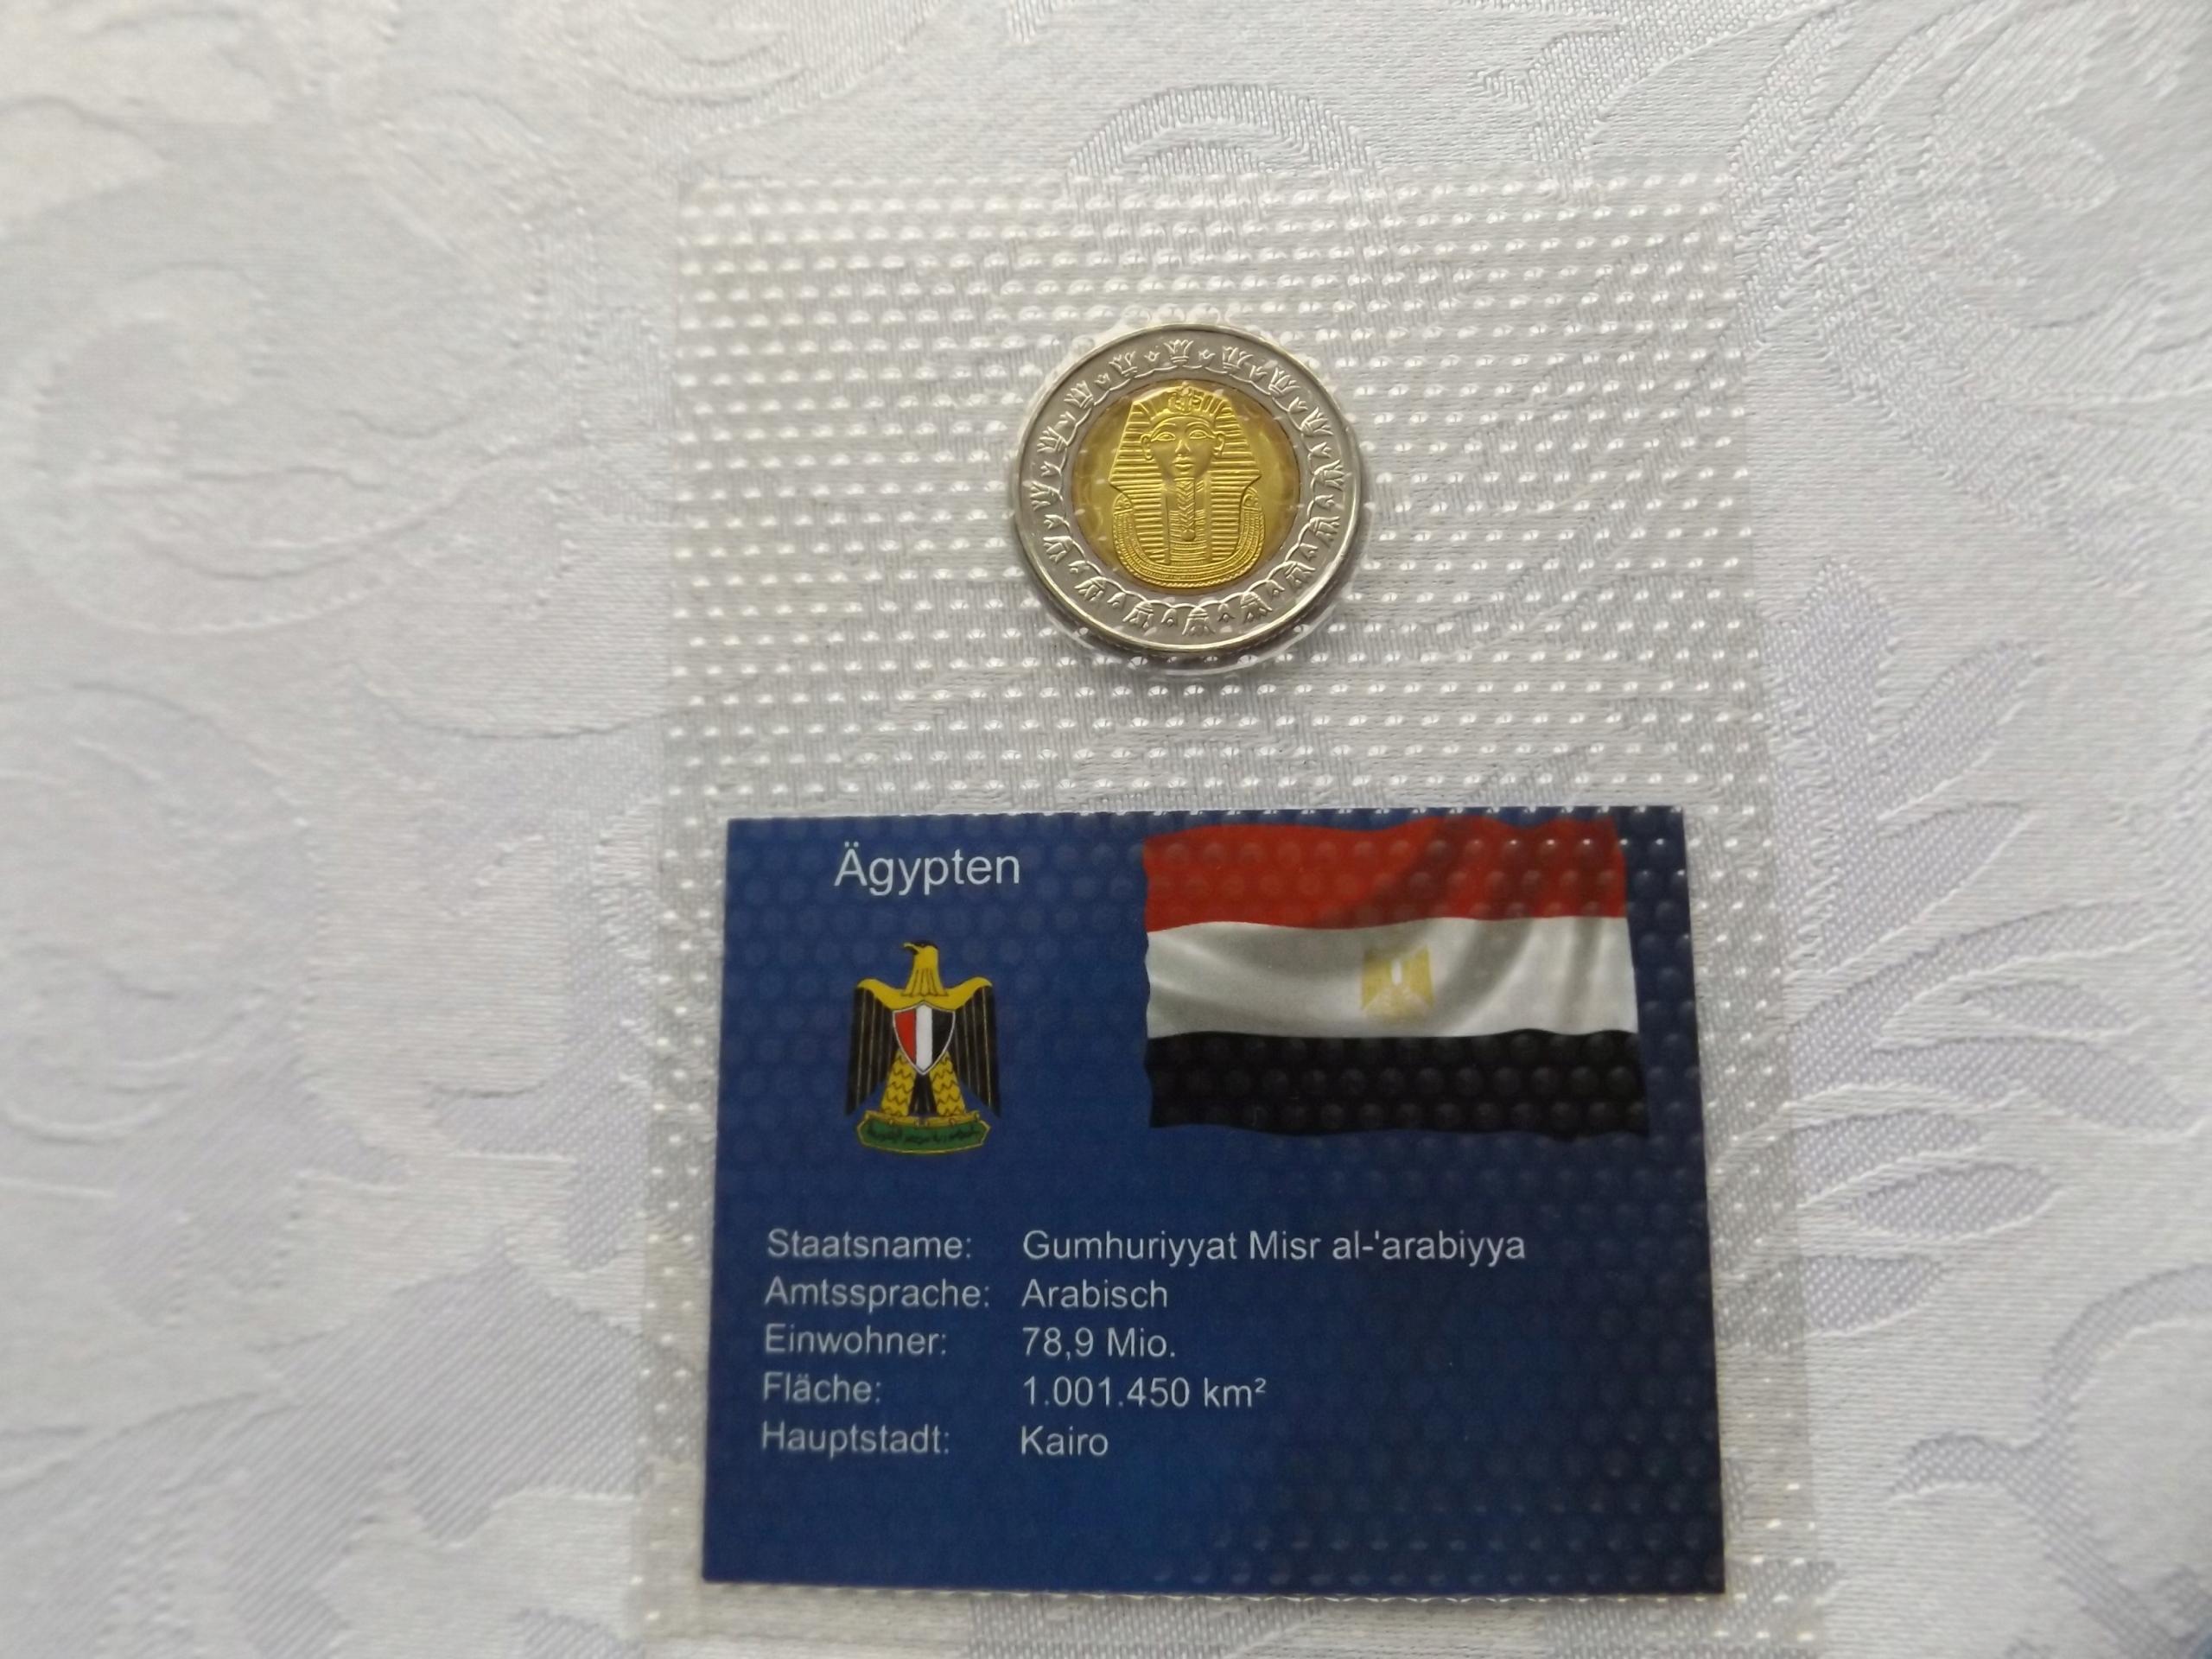 EGIPT 1 FUNT 2007/2005 r. MENNICZY STAN BLISTER